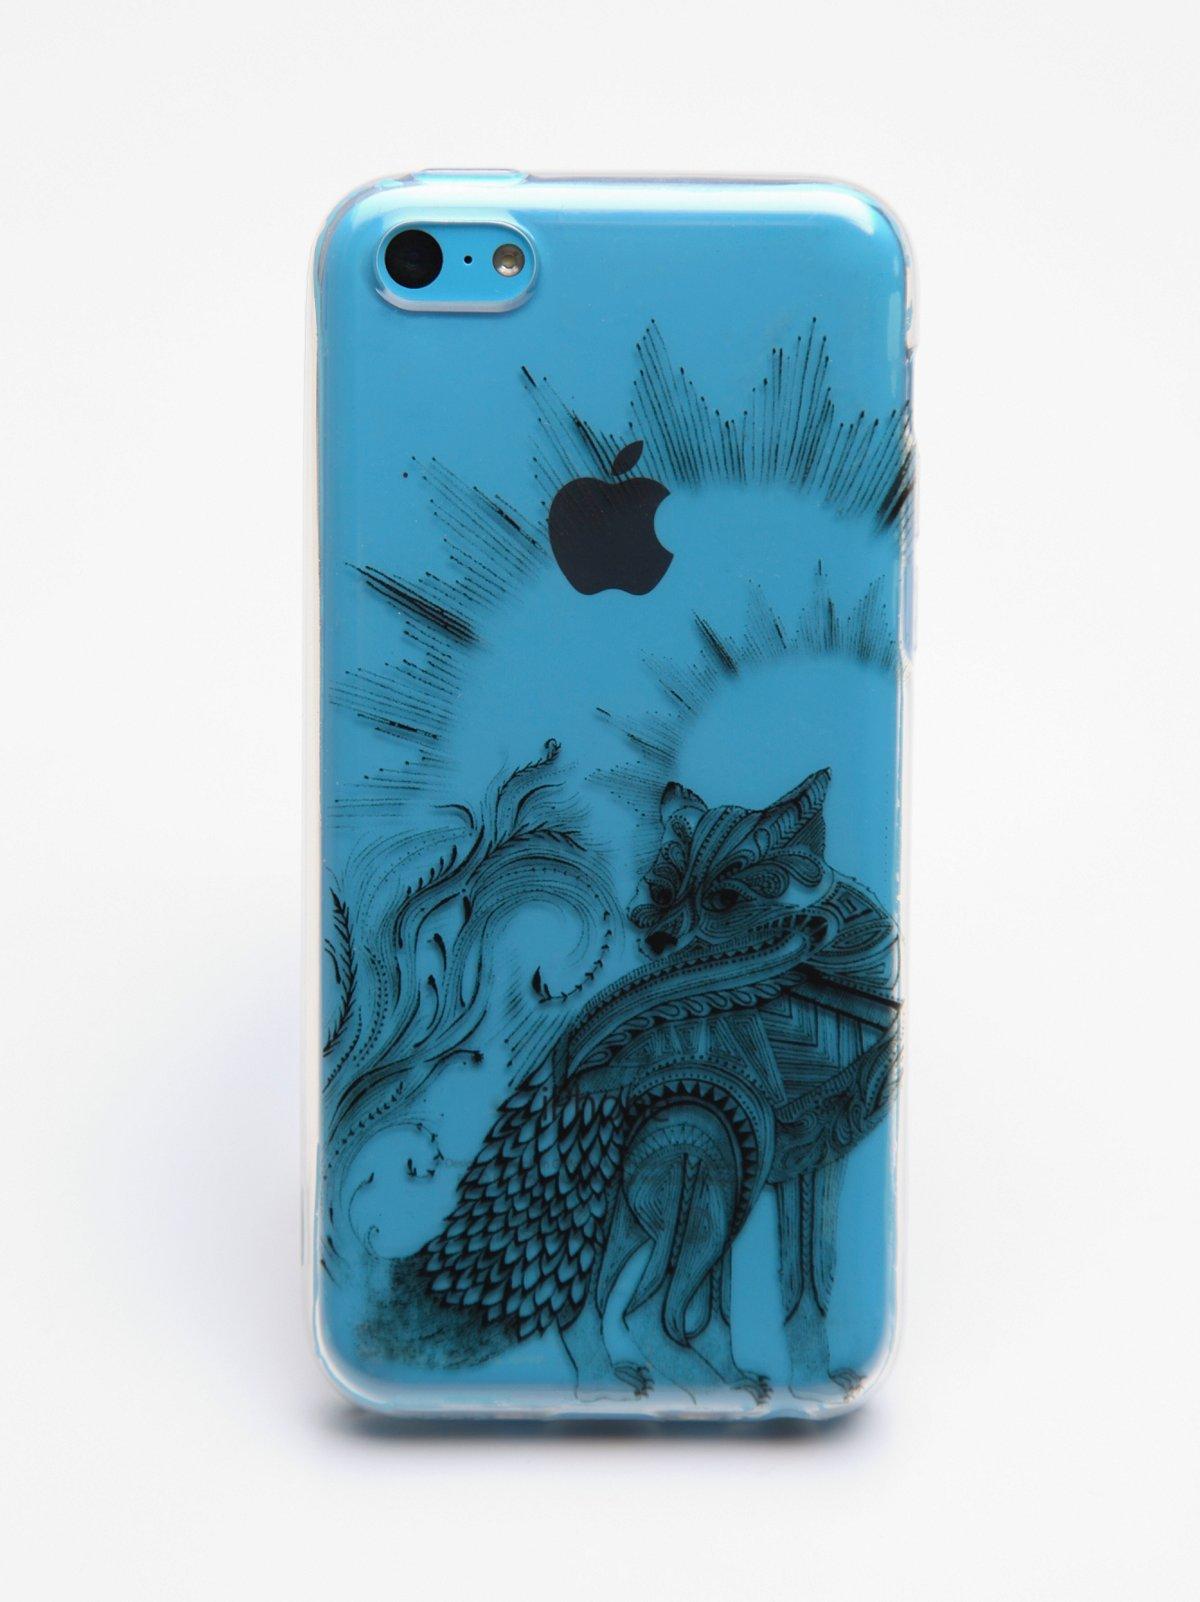 Clear iPhone 5/5C Case